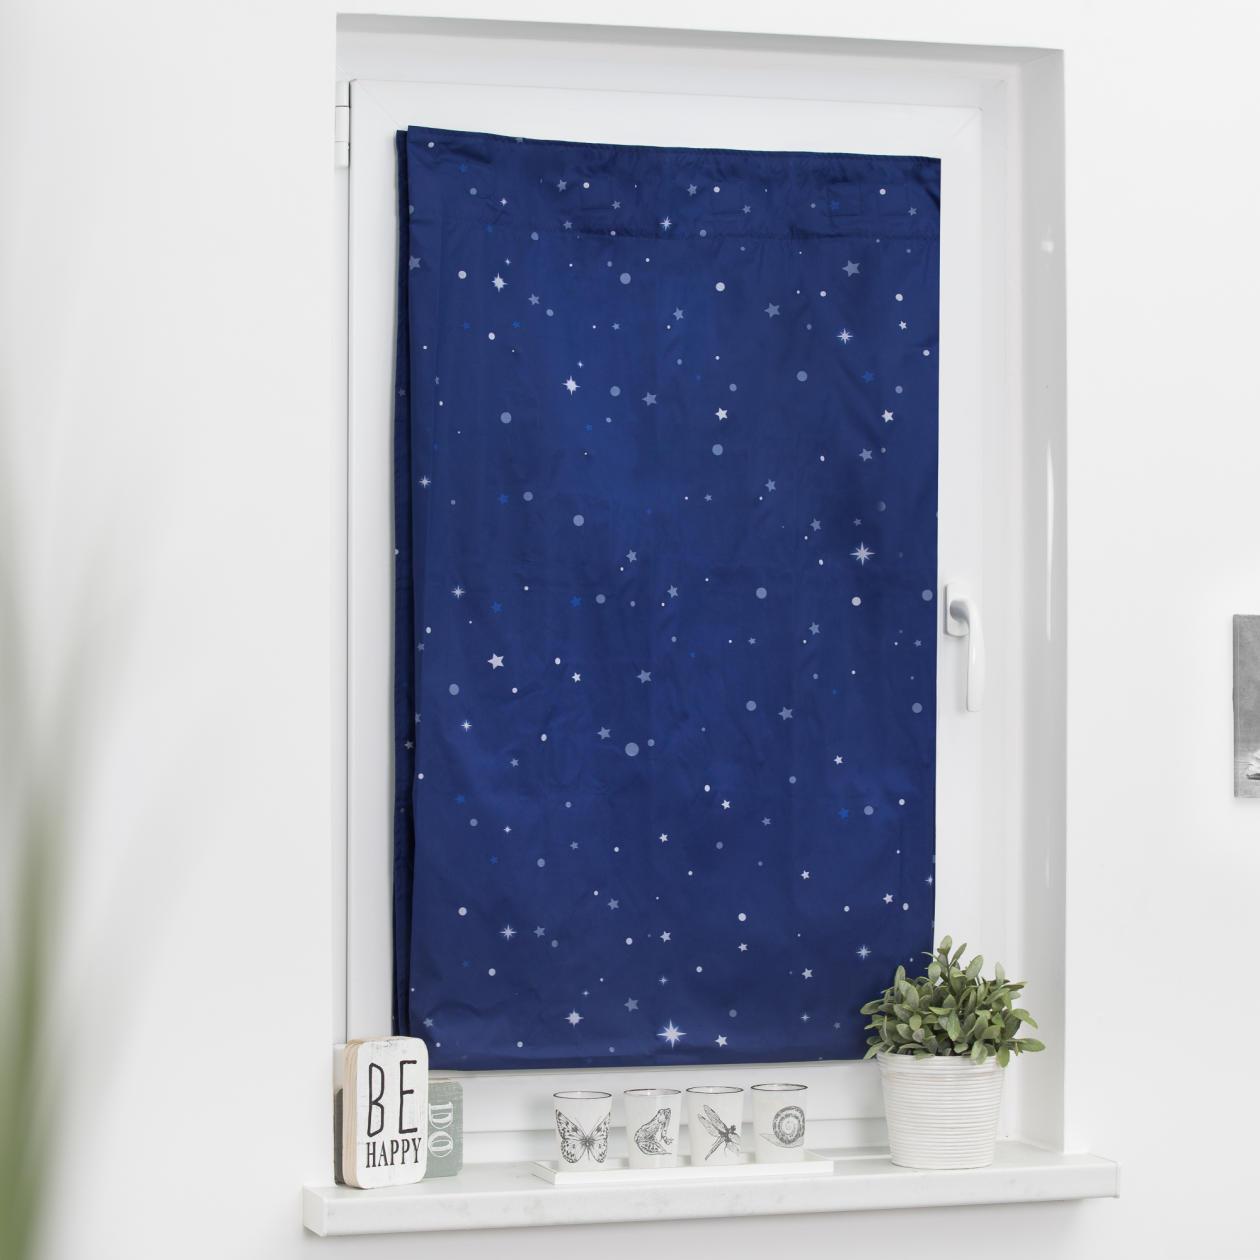 vorhang haftfix mit saugnapf reiserollo verdunkelung lichblick shop. Black Bedroom Furniture Sets. Home Design Ideas